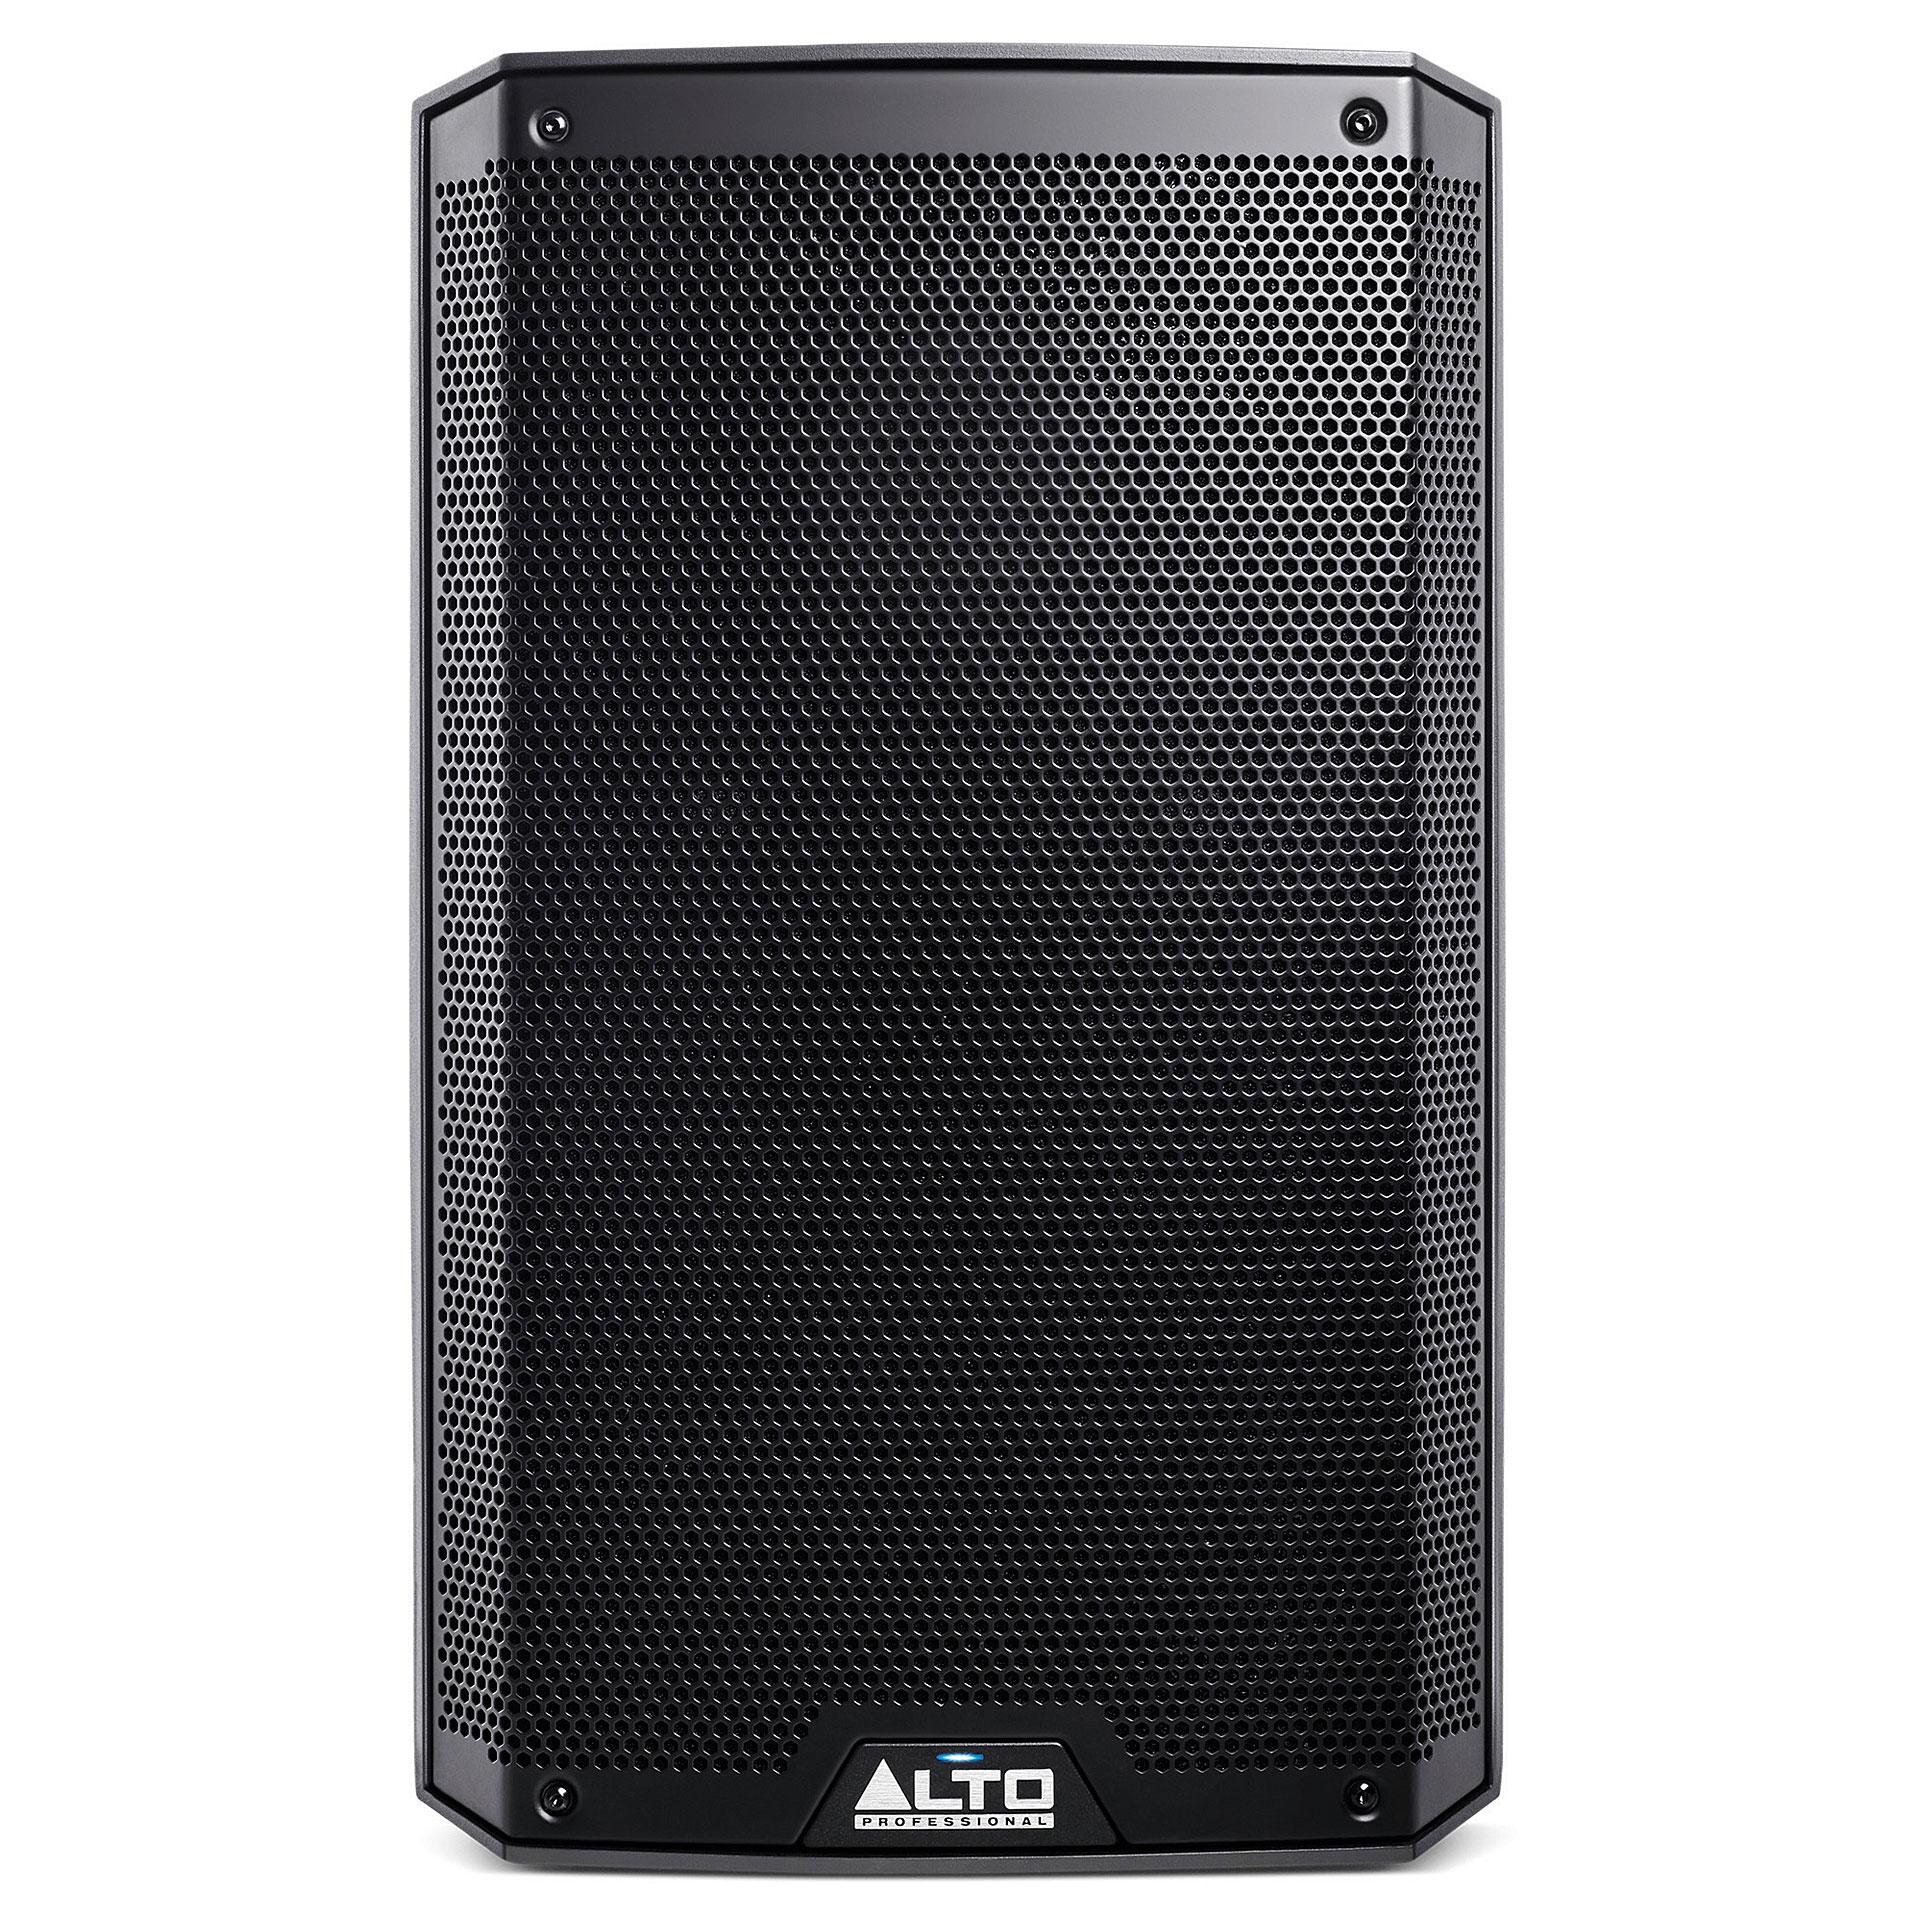 Alto Truesonic TS 310 Active PA Speakers